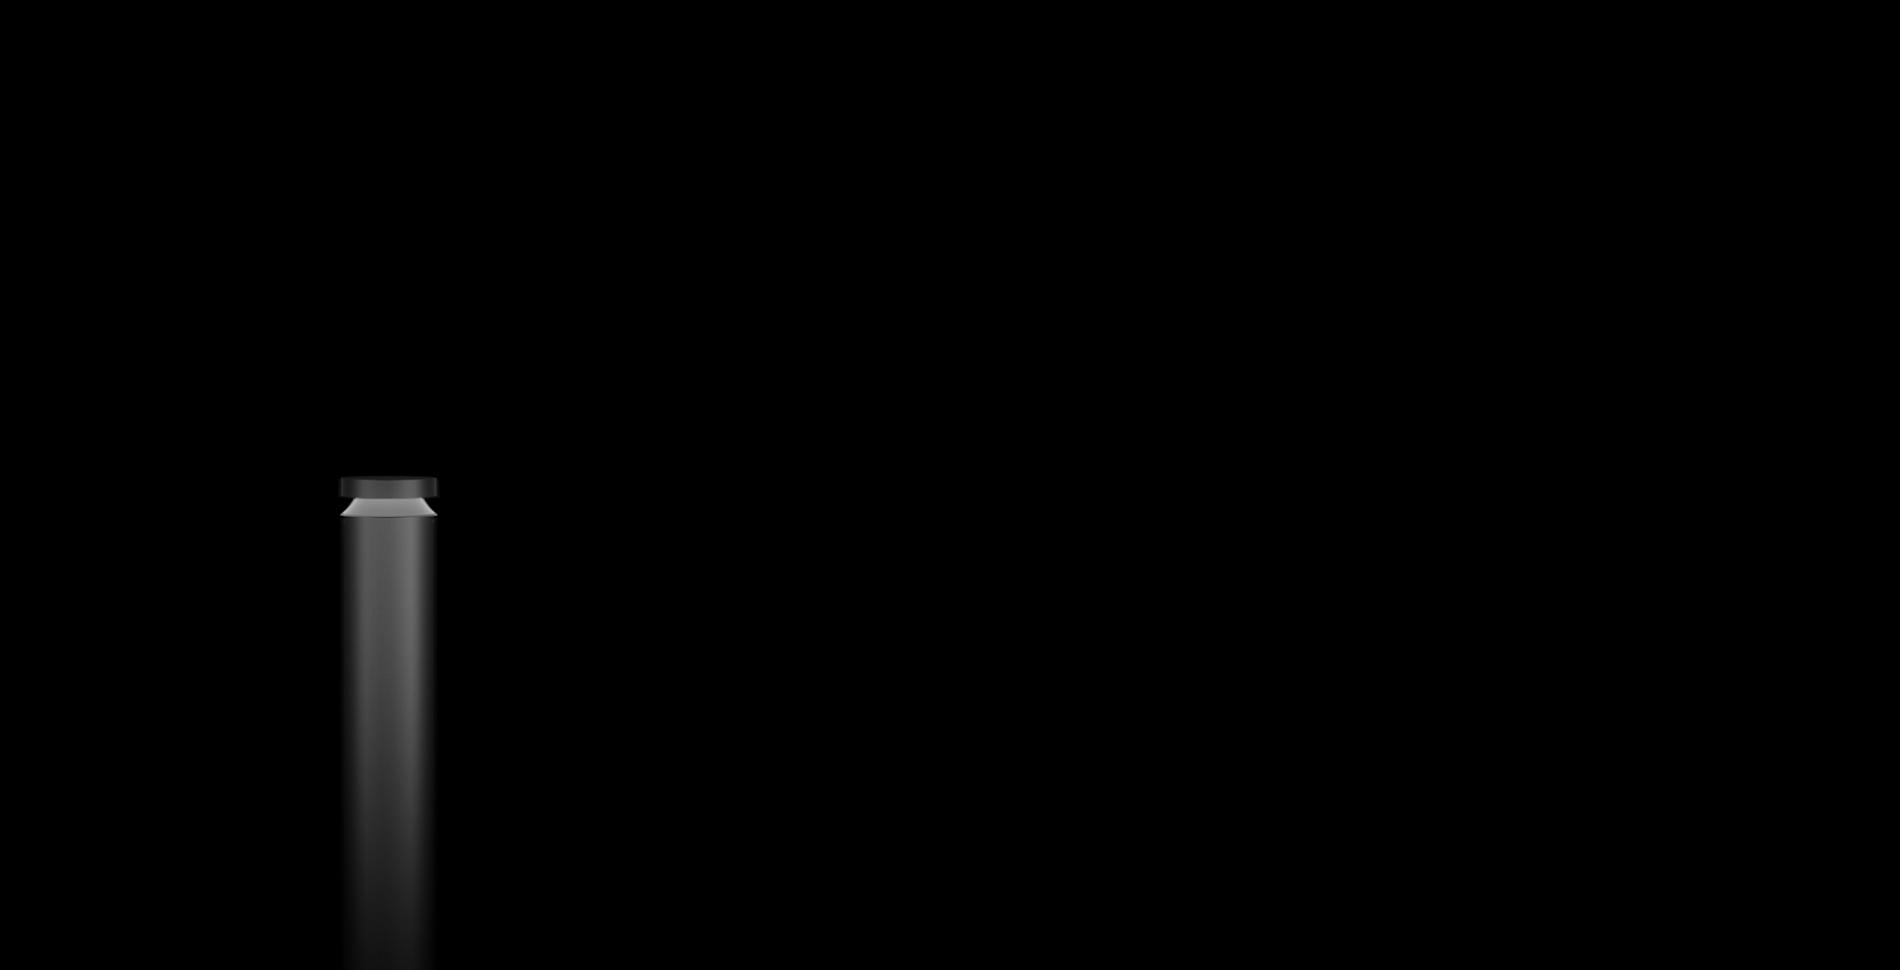 Sequenza-0222